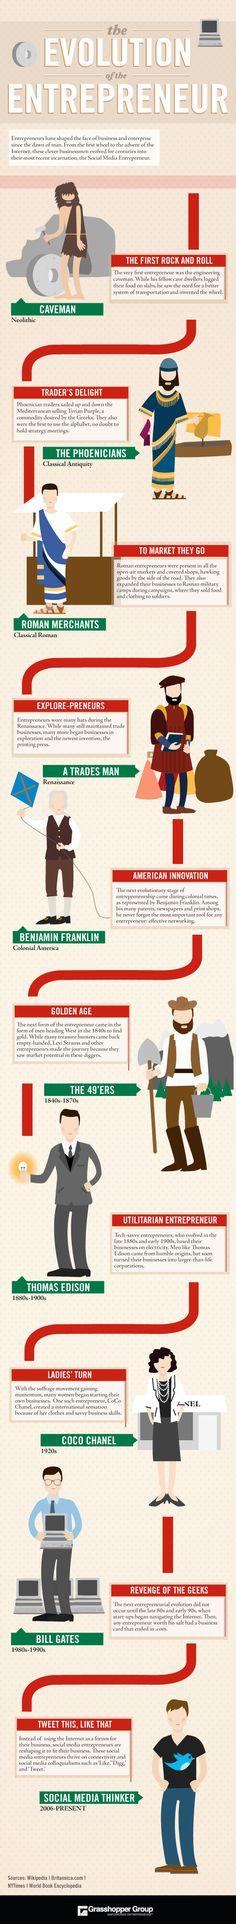 The evolution of the entrepreneur #infographic